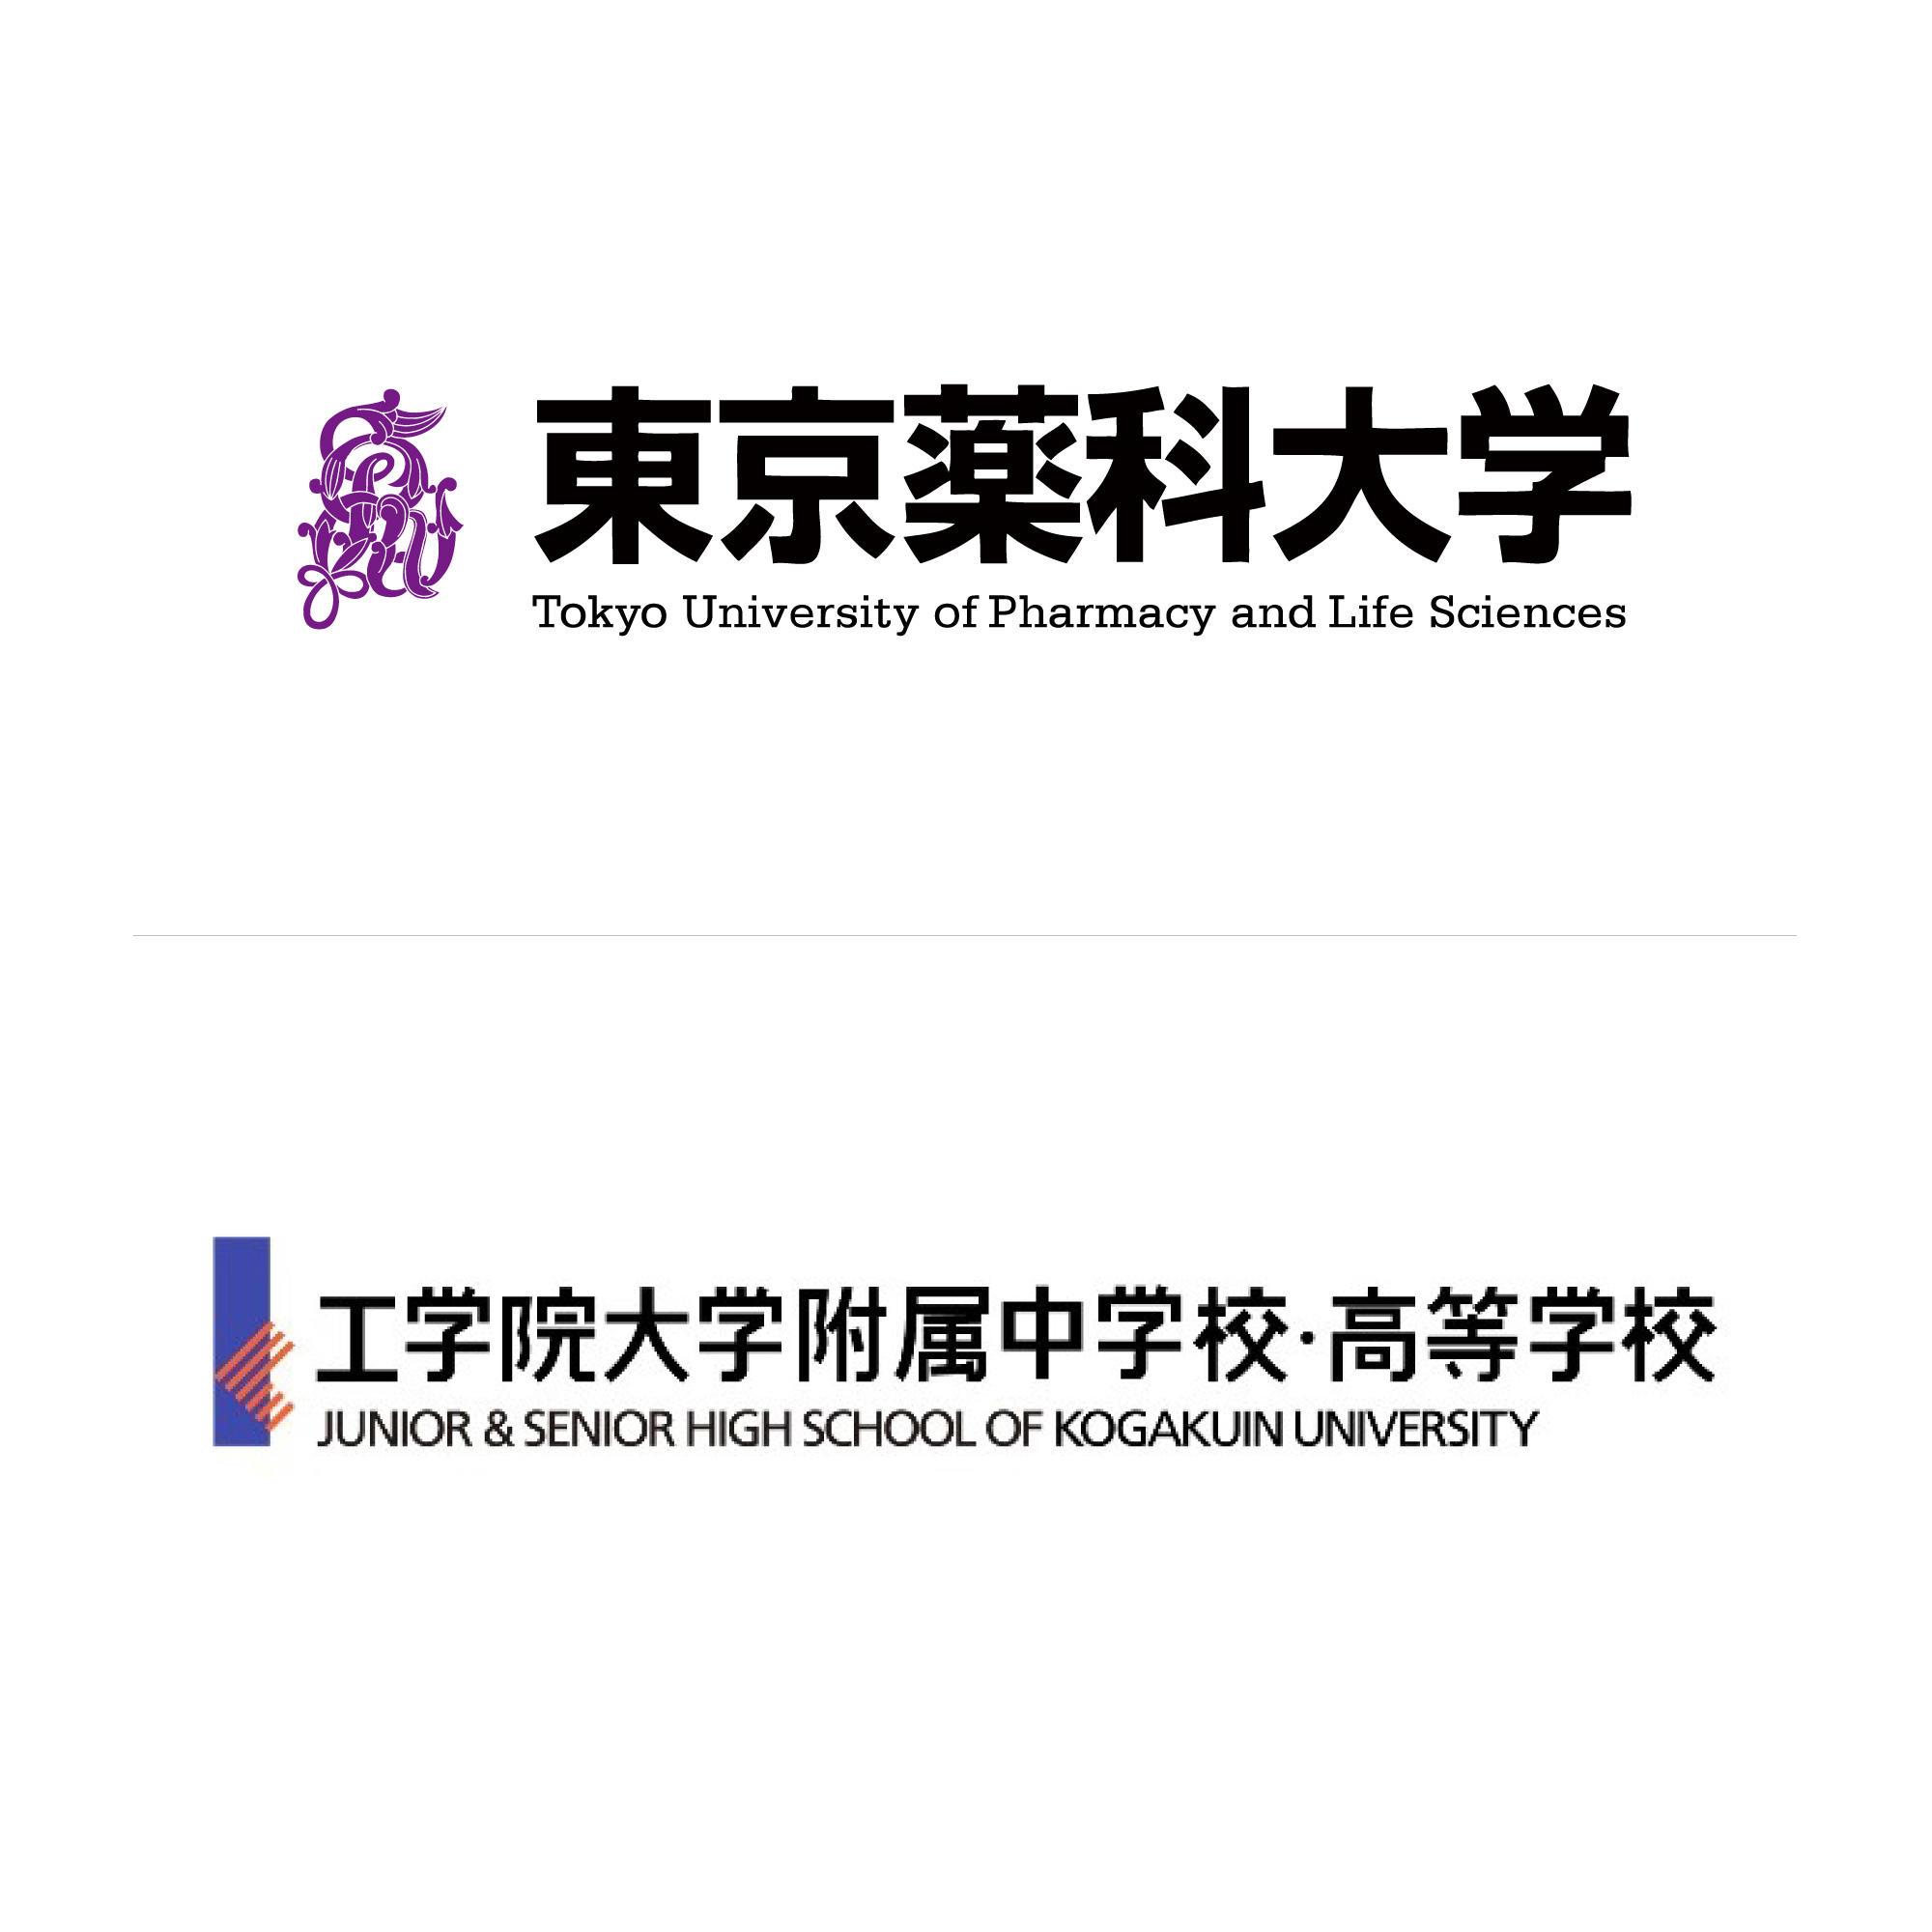 東京薬科大学が工学院大学附属中学校・高等学校と高大接続教育に向け『高大連携協定』を締結 -- 医療、環境、工学分野での優秀な人材育成へ